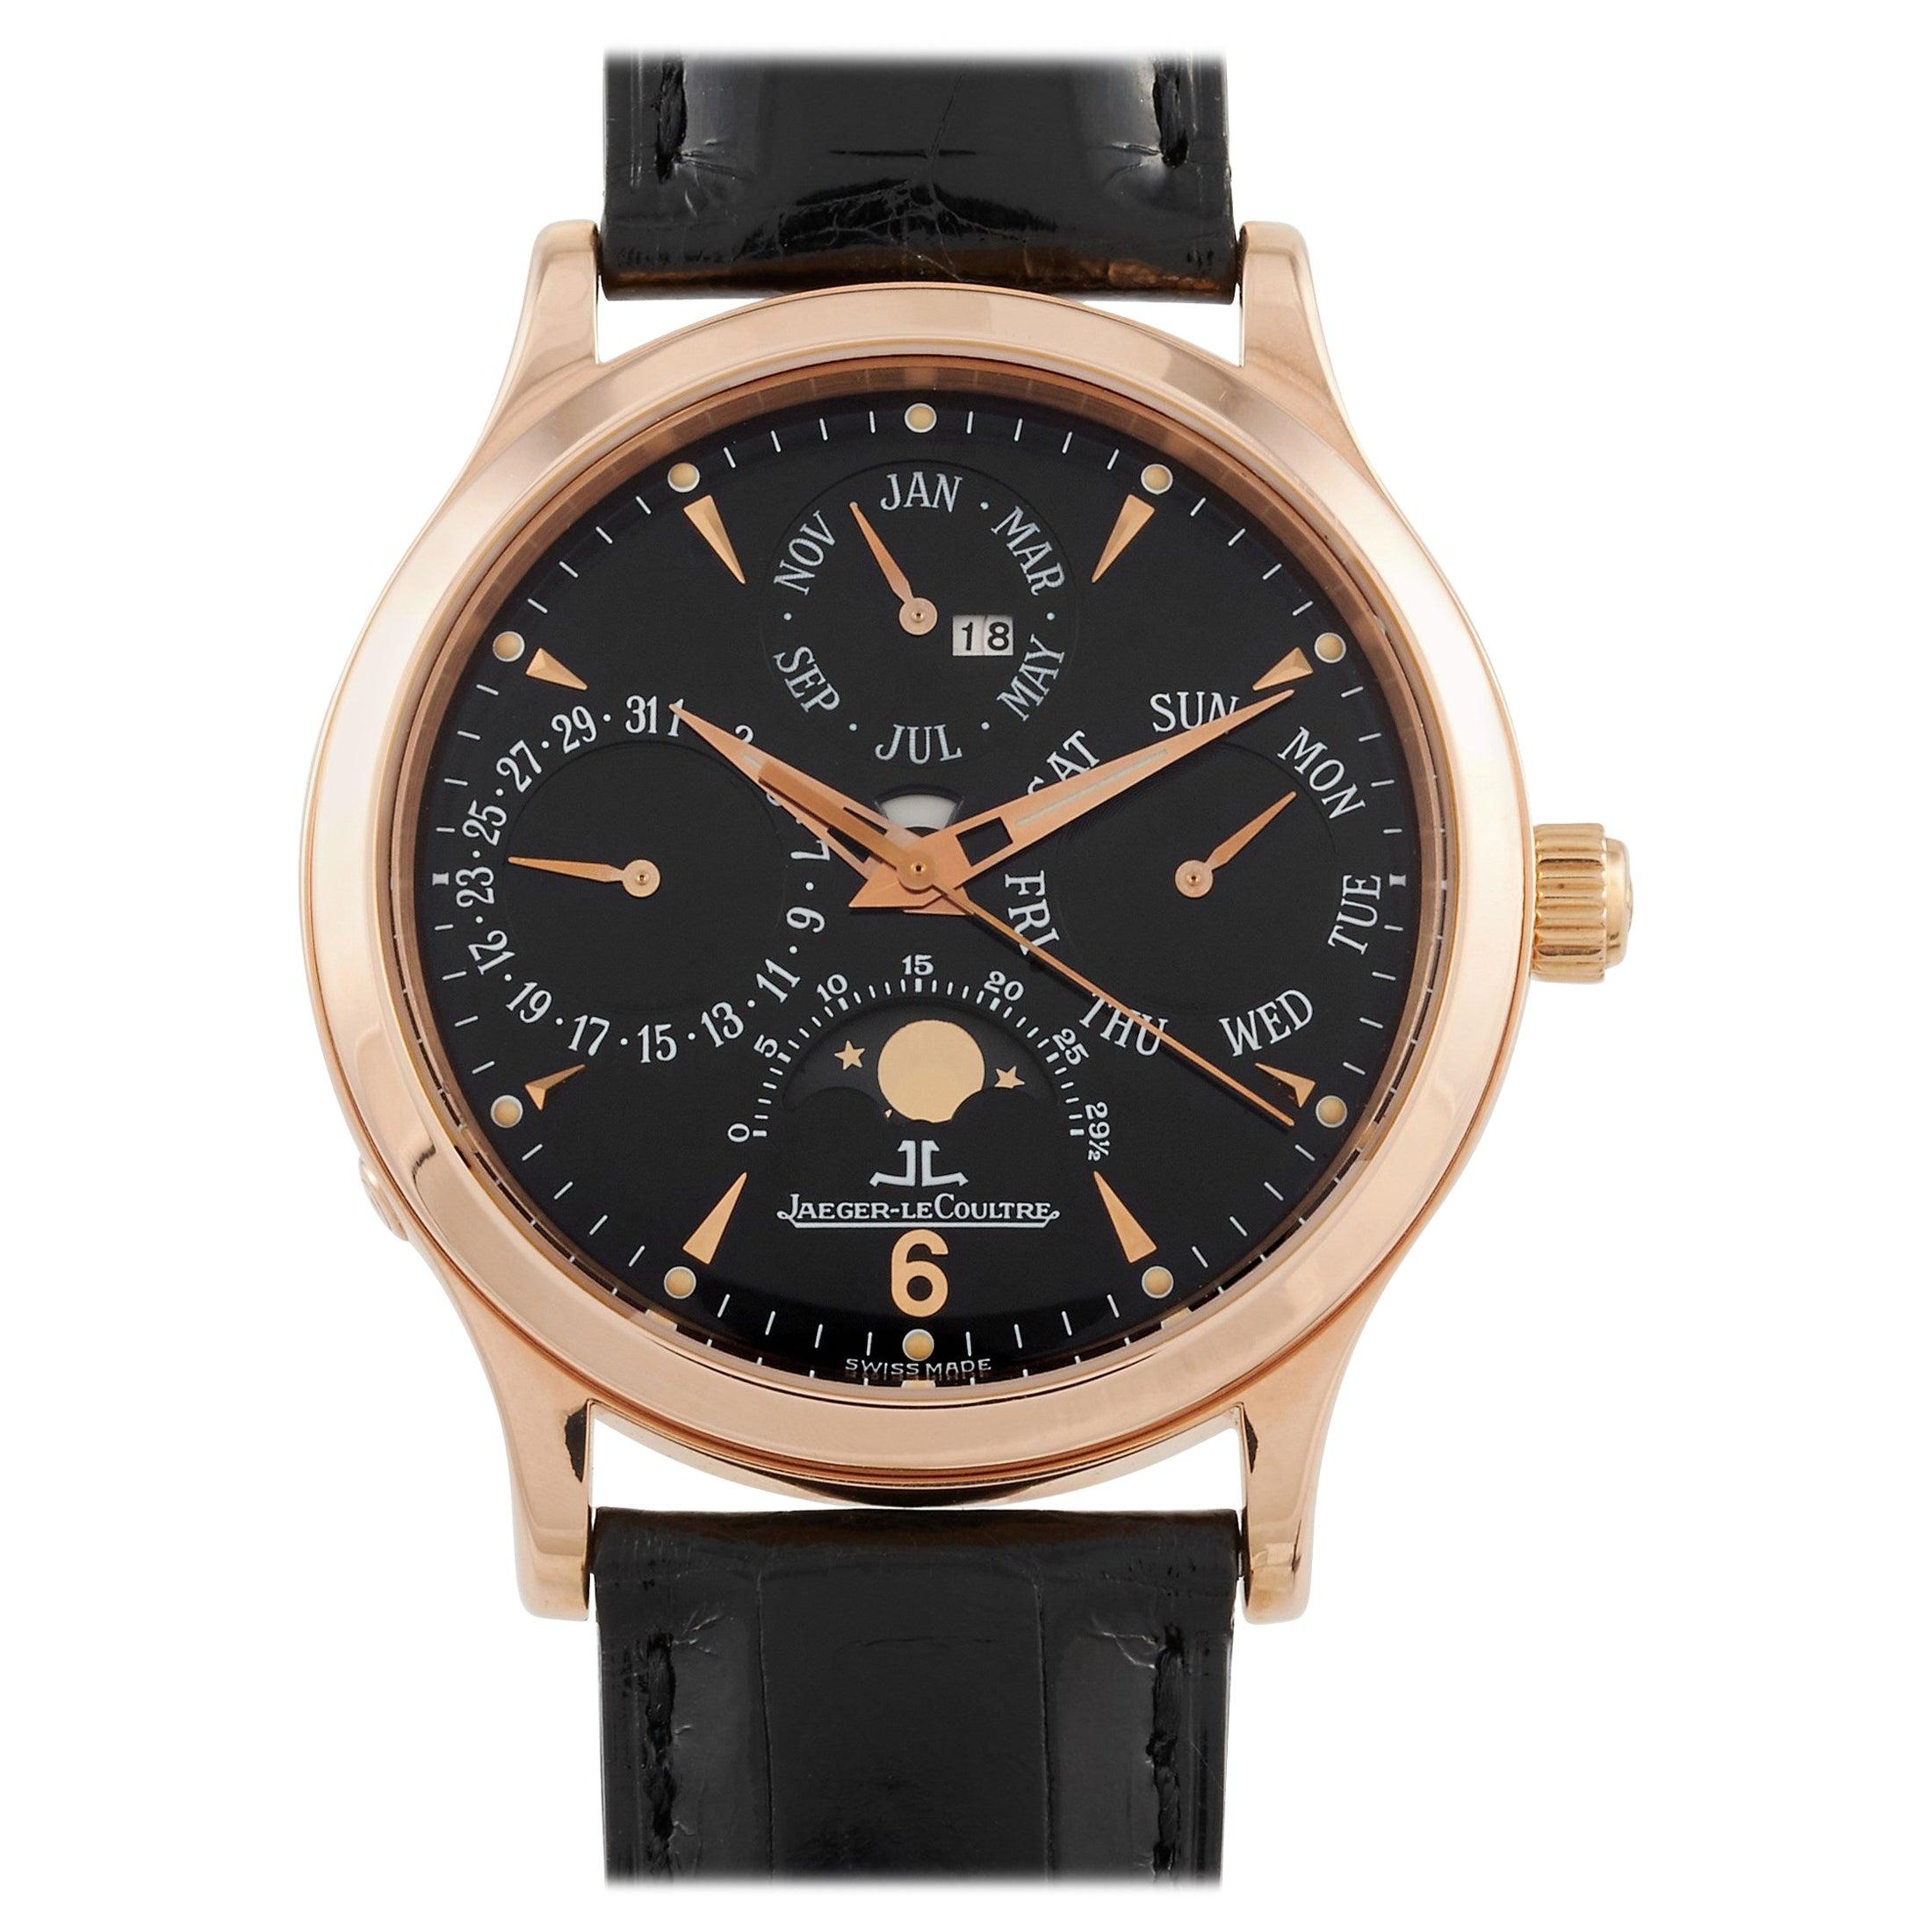 Jaeger-LeCoultre Master Control Perpetual Calendar Rose Gold Watch 140.2.80